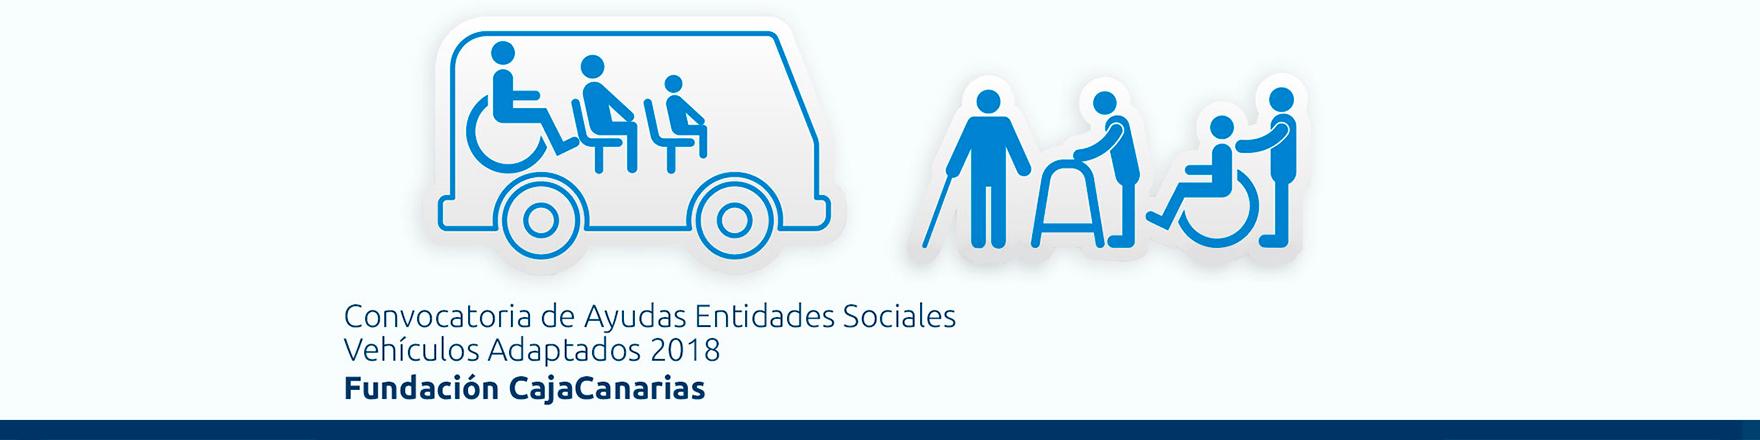 convocatoria vehiculos adaptados 2018 bg seccion